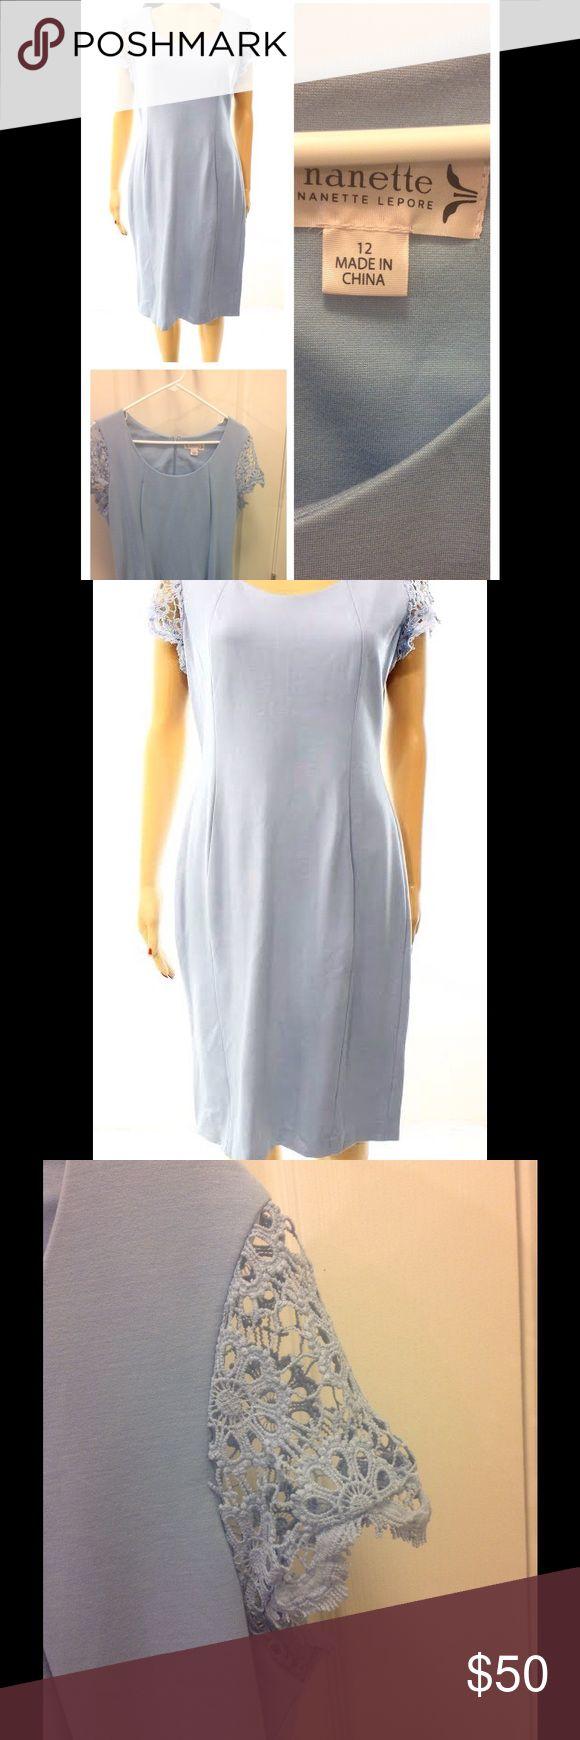 Nanette Lepore Powder Blue crochet sleeves dress Pretty blue stretch sheath dress with crochet cap sleeves. Never worn, new Nanette Lepore Dresses Midi